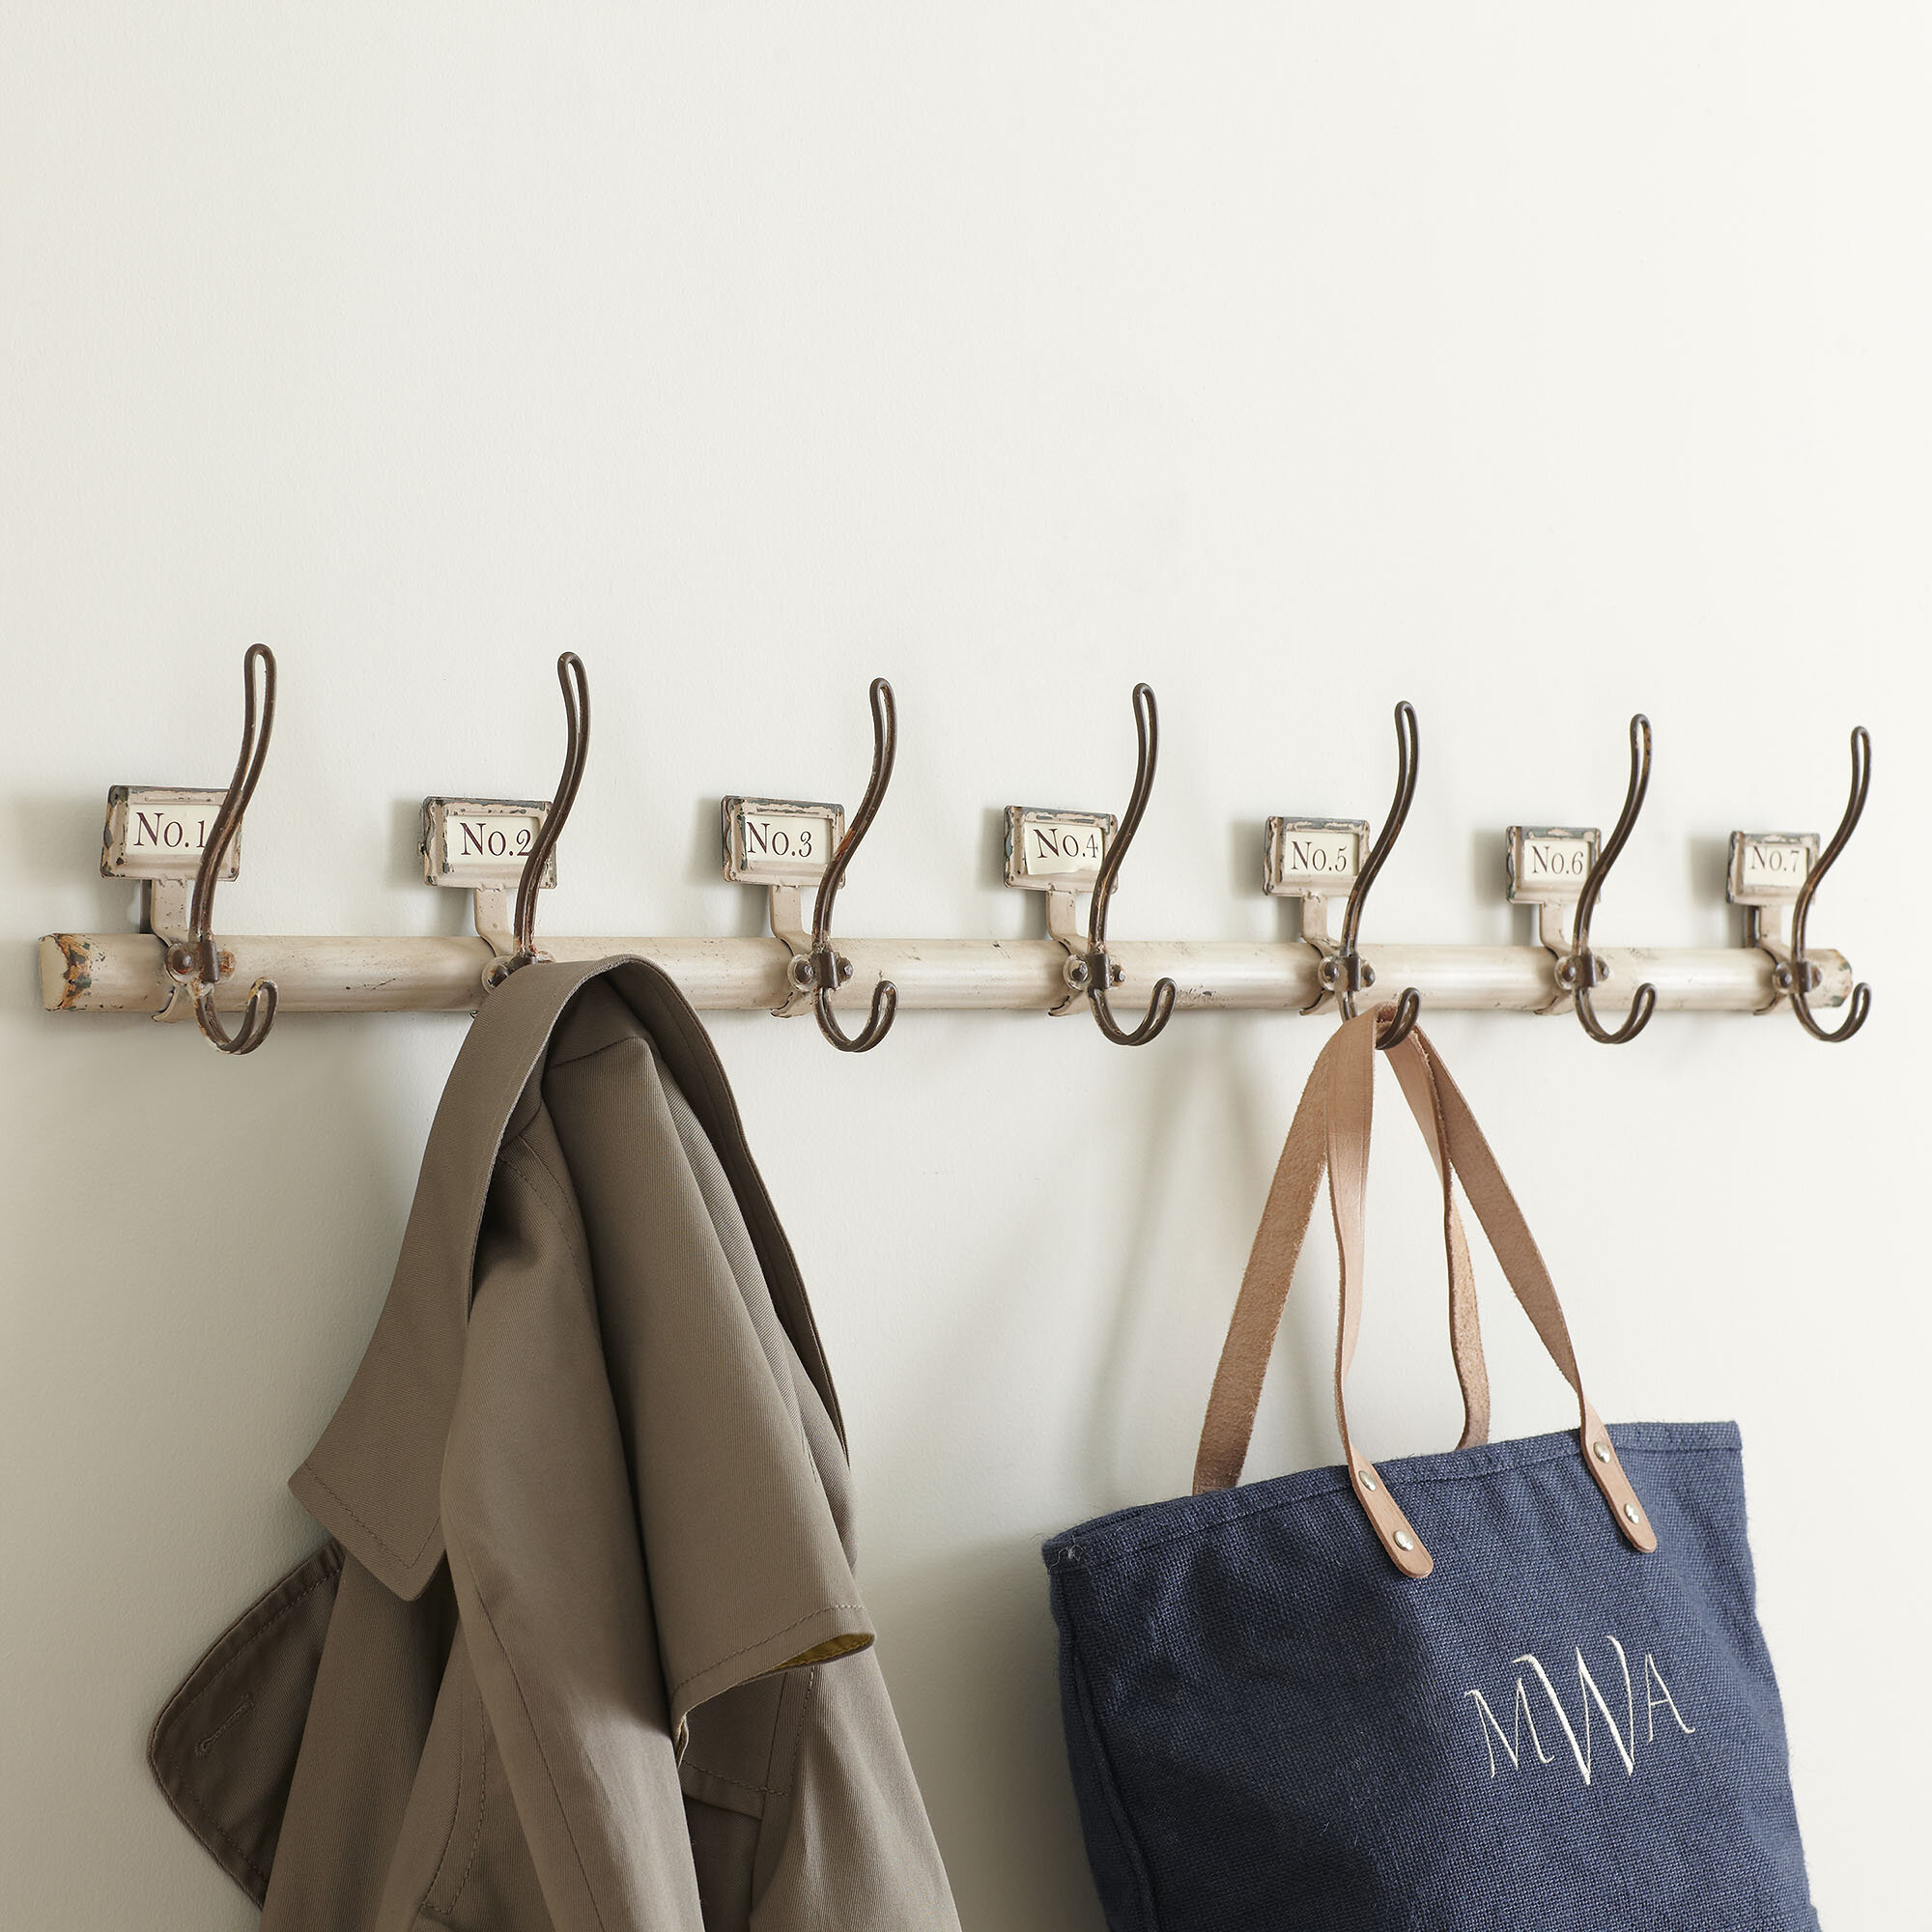 market decor picture patchwork hangers hanging xxx pewter decorative wall maya buy world mirror